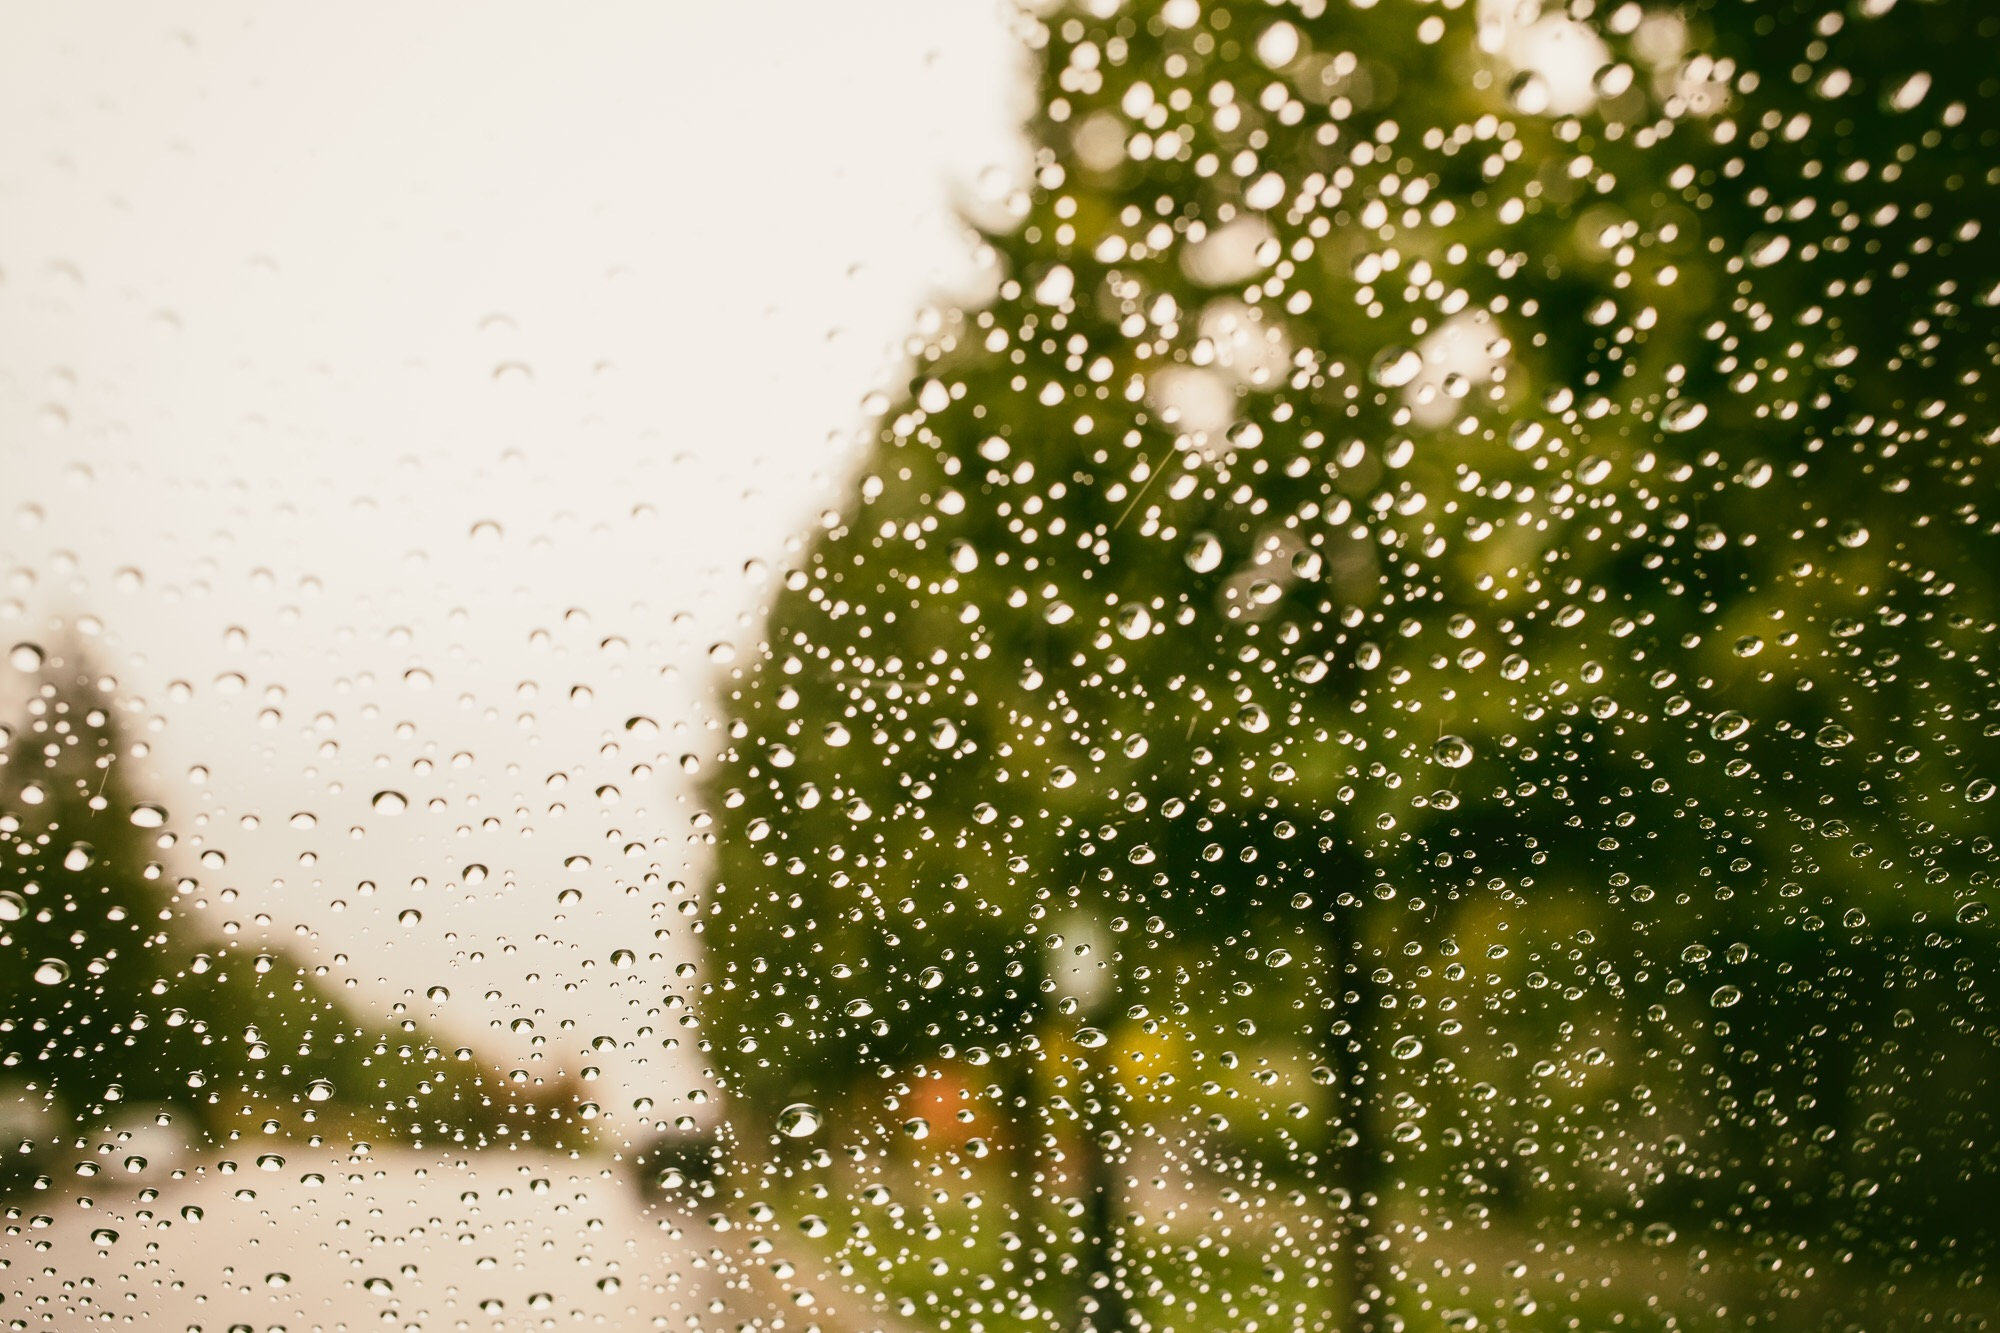 It's raining rain